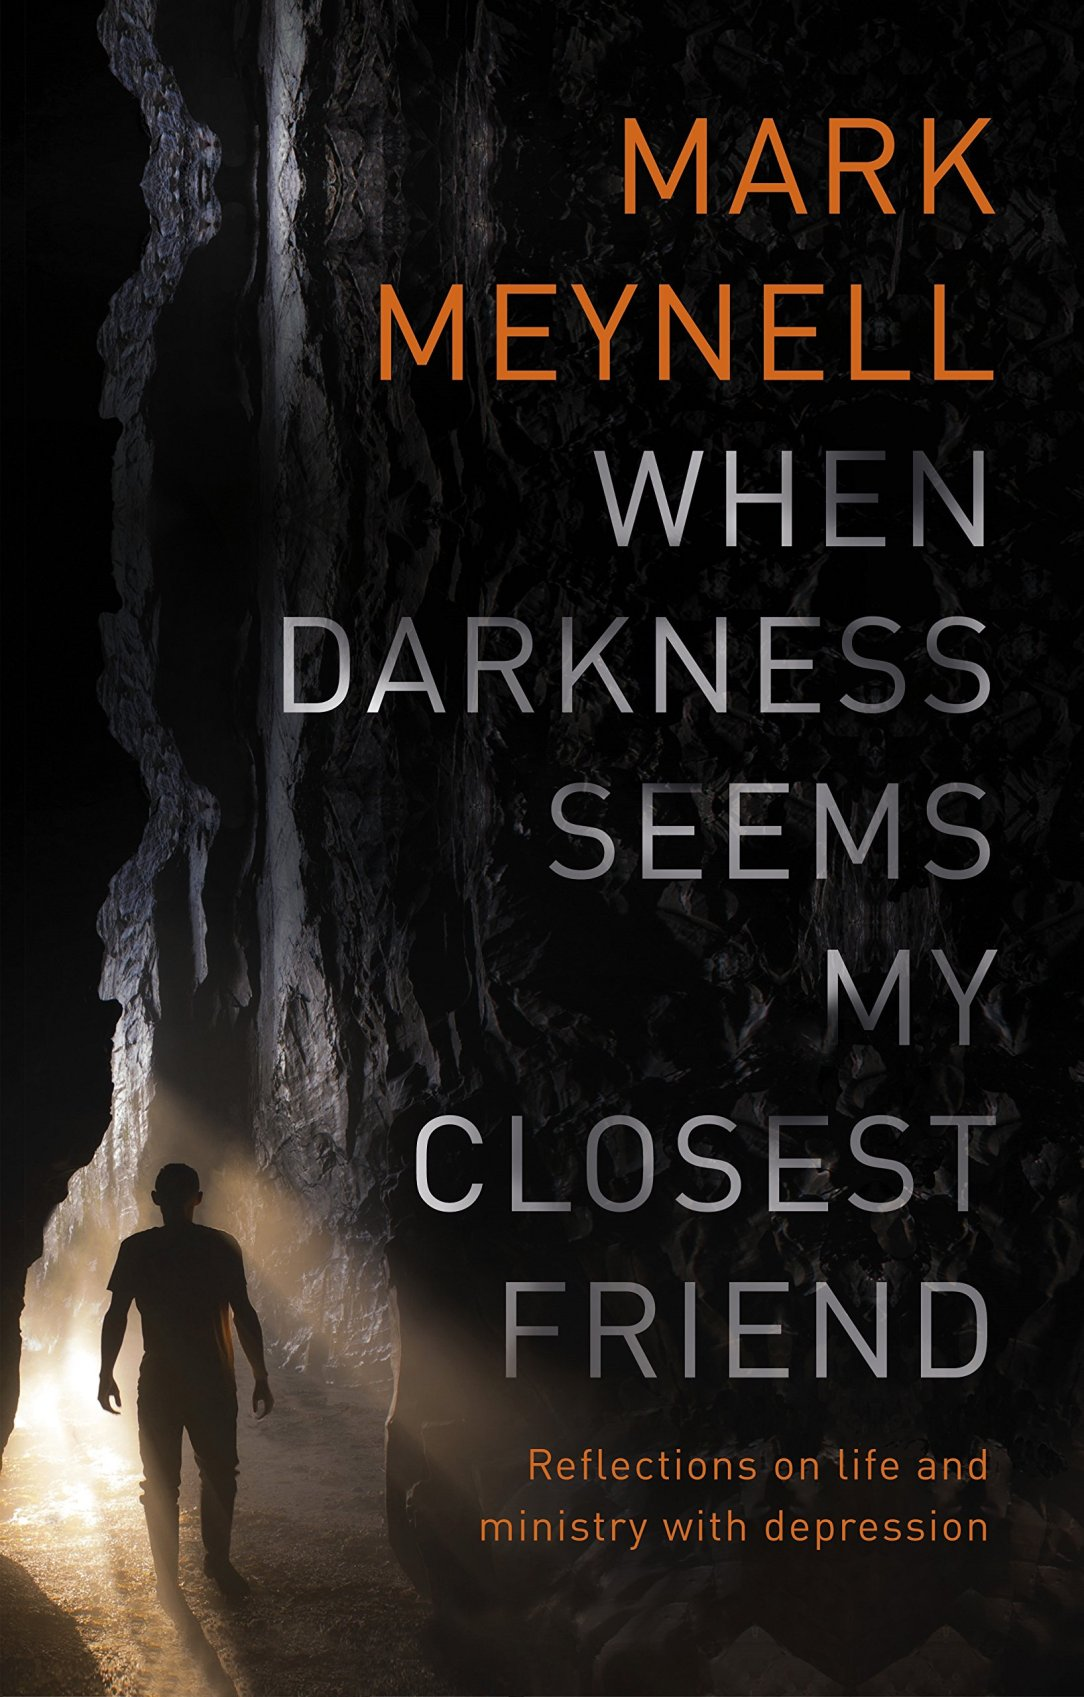 Mark Meynell, depression, When darkness seems my closest friend